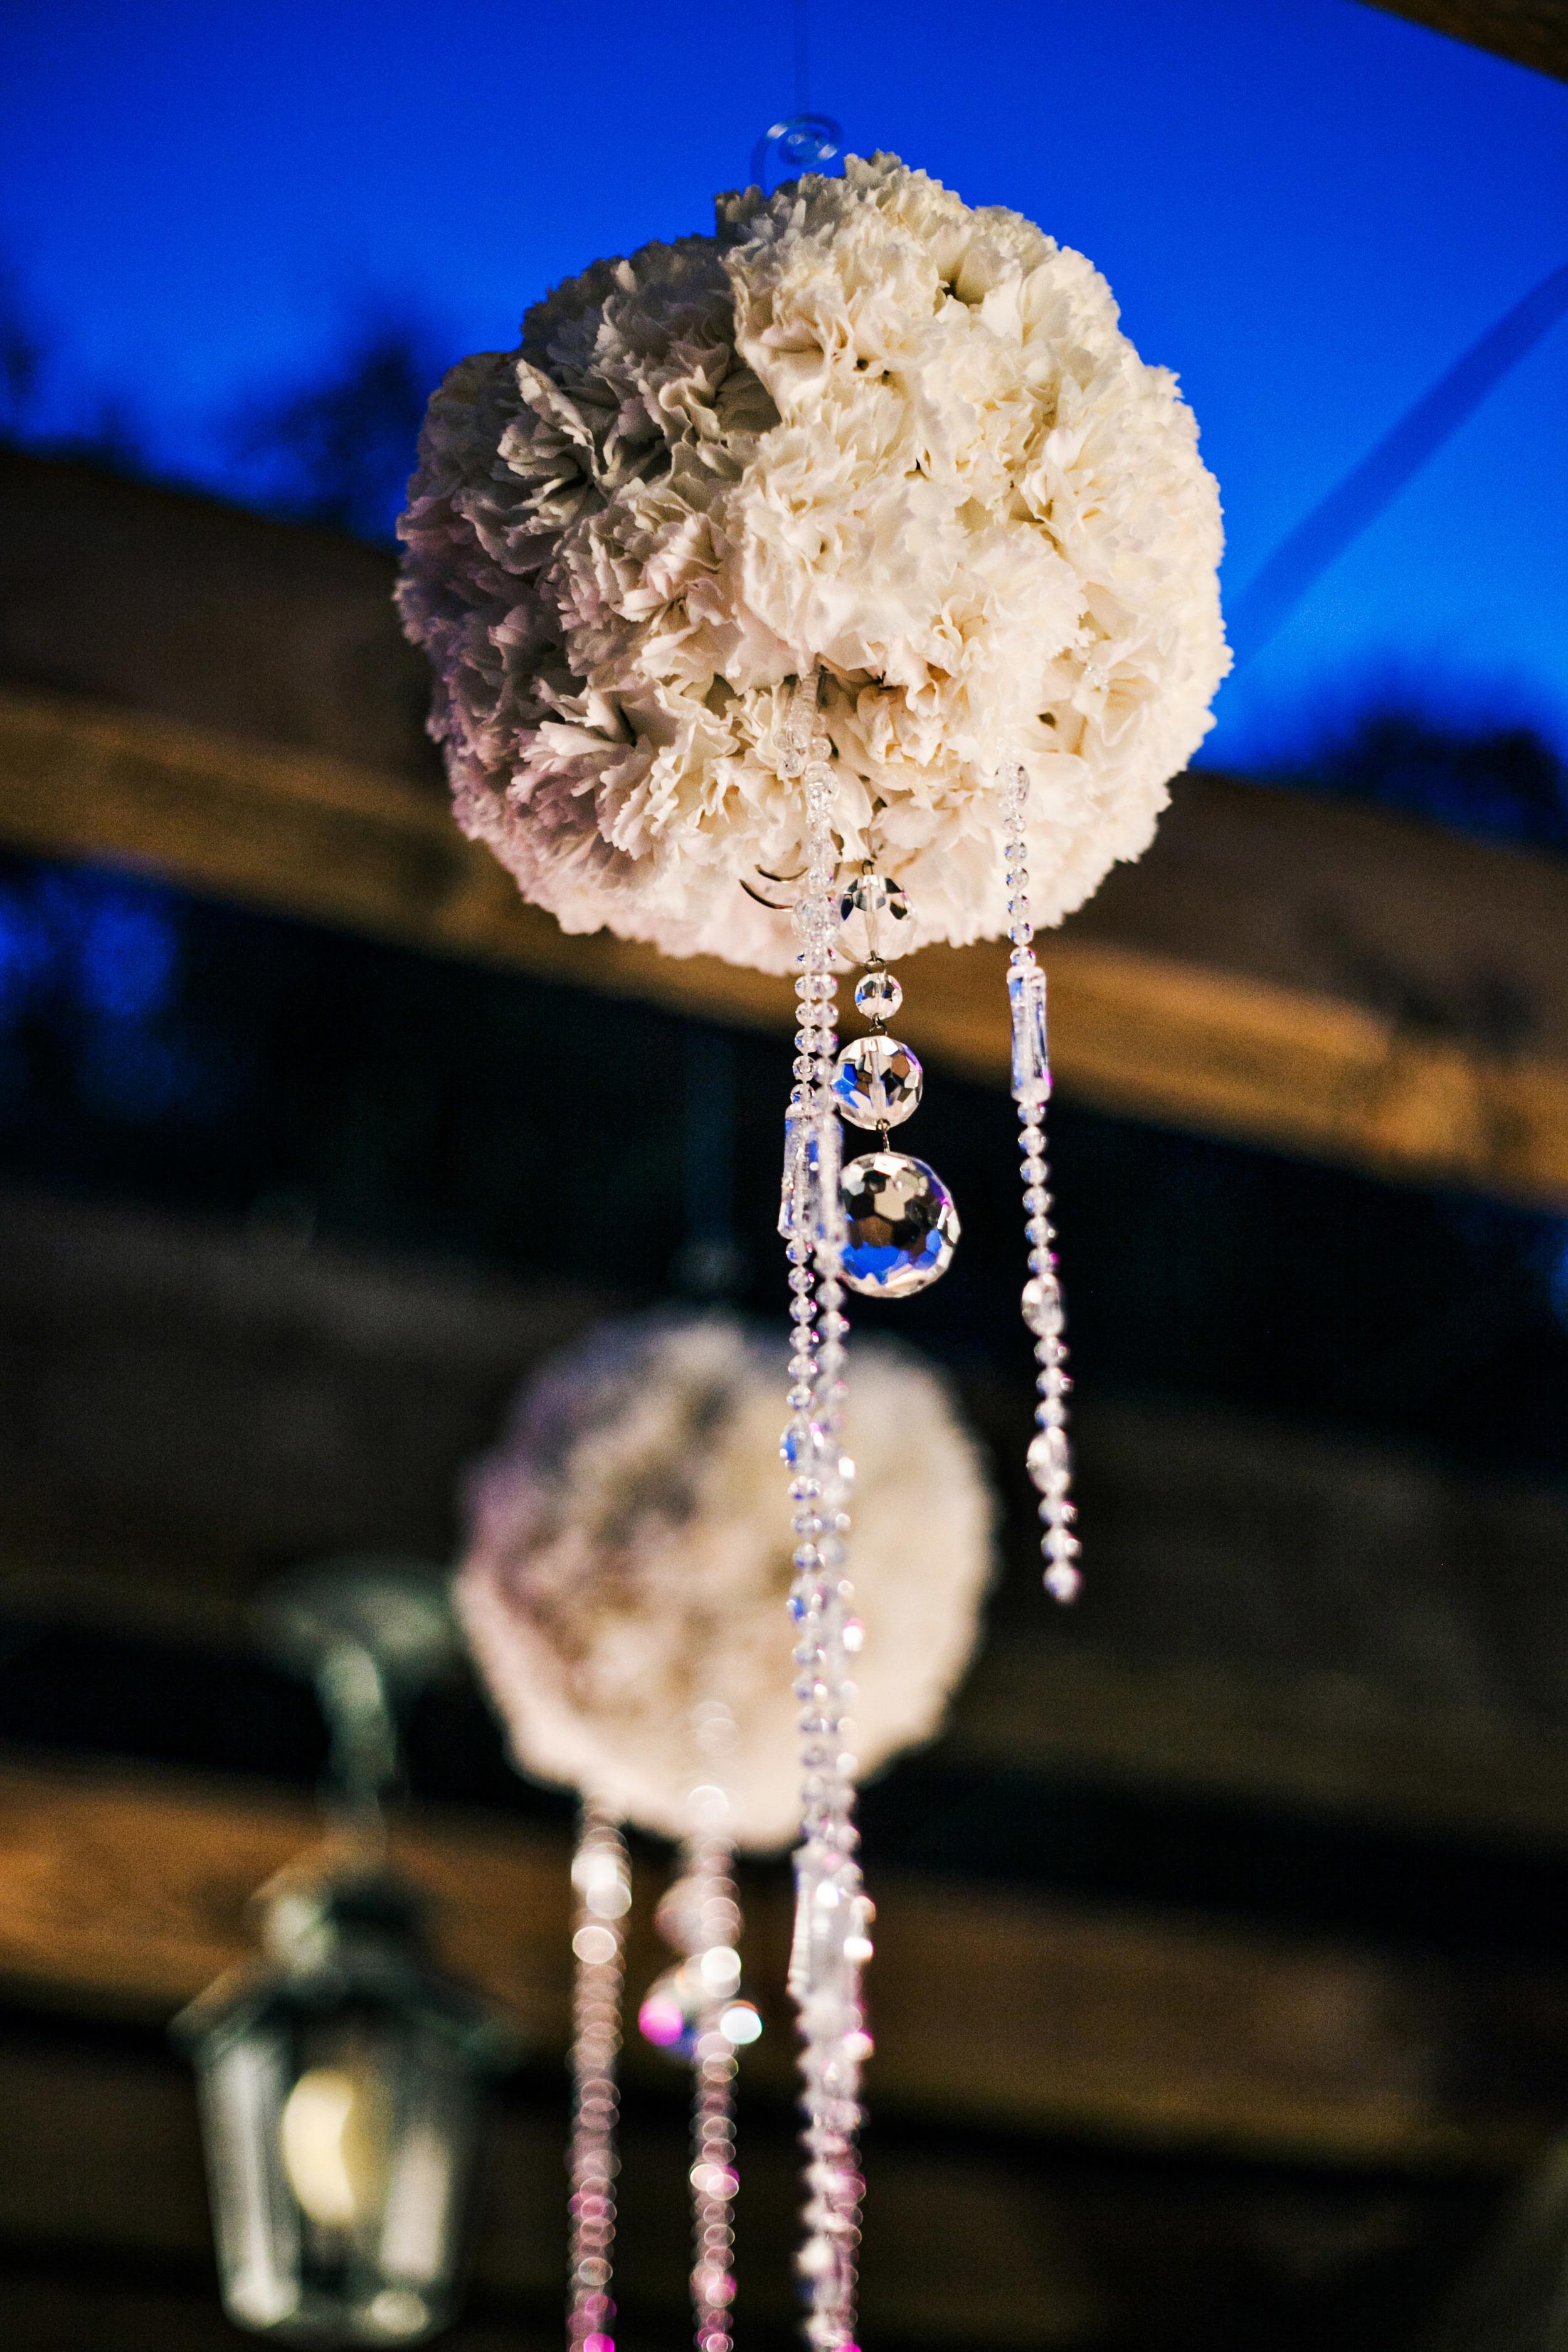 32. RS - flower pomeanders, hanging flowers with crystals, wedding bar flowers, white wedding flowers, modern romantic wedding, summer wedding.jpg